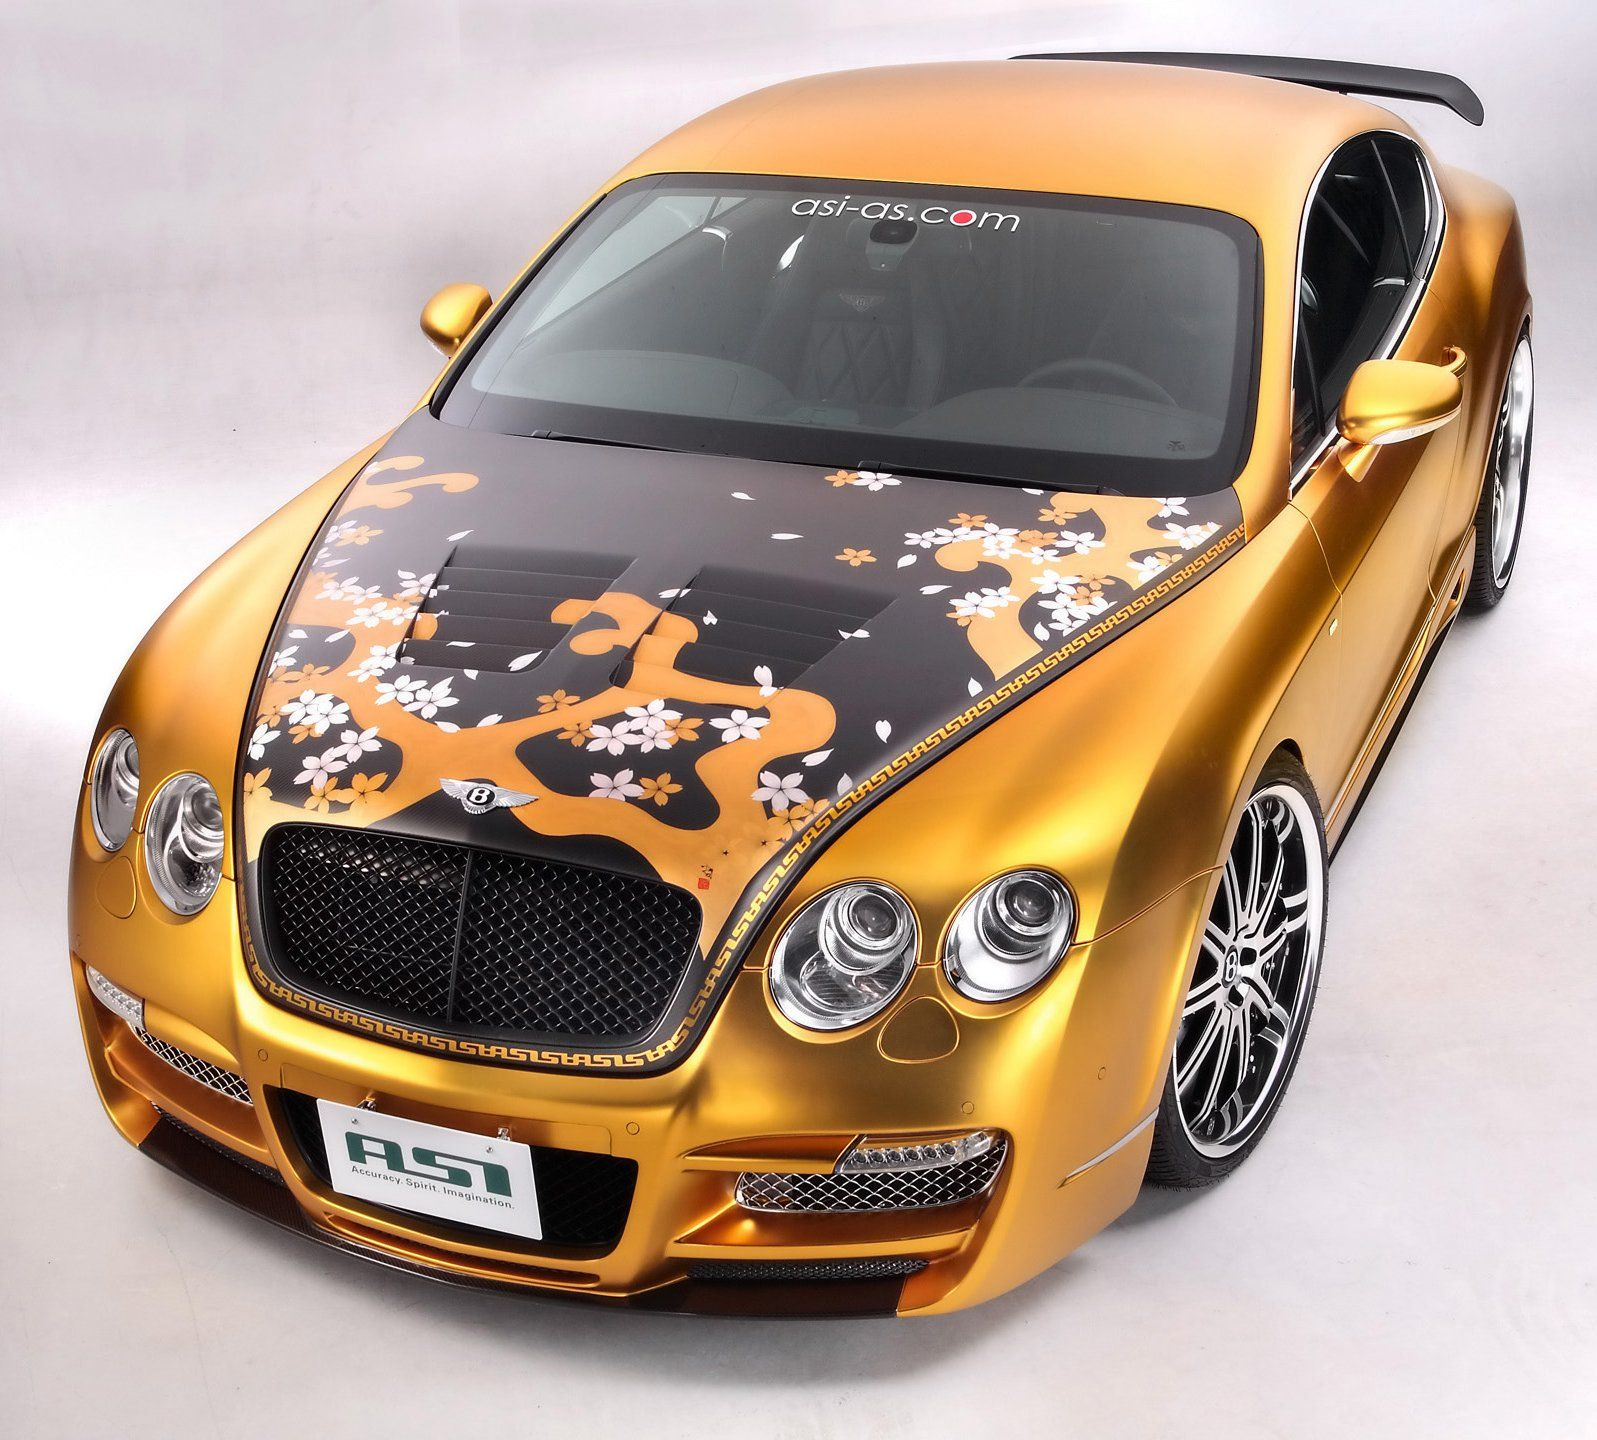 Bentley 2010: POWER CARS: Bentley Continental GT By ASI